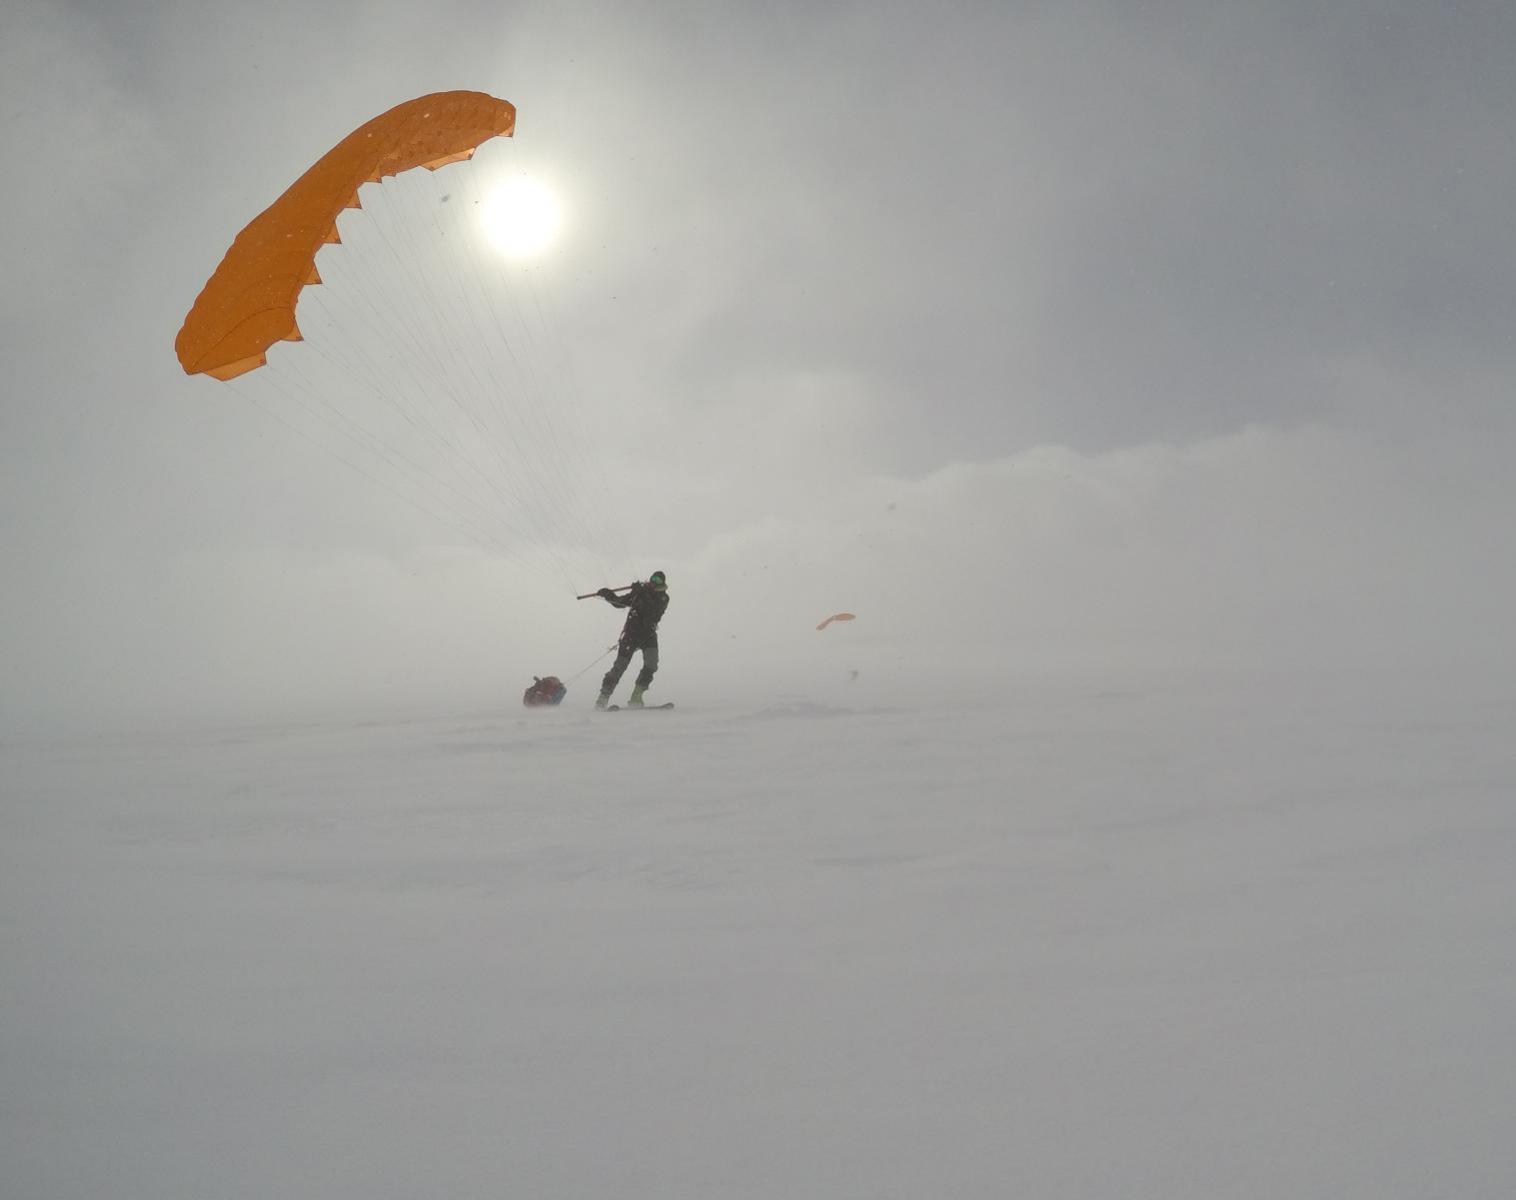 Groenland  Traversée du Groenland en pulka et snowkite   Ski & Pulka